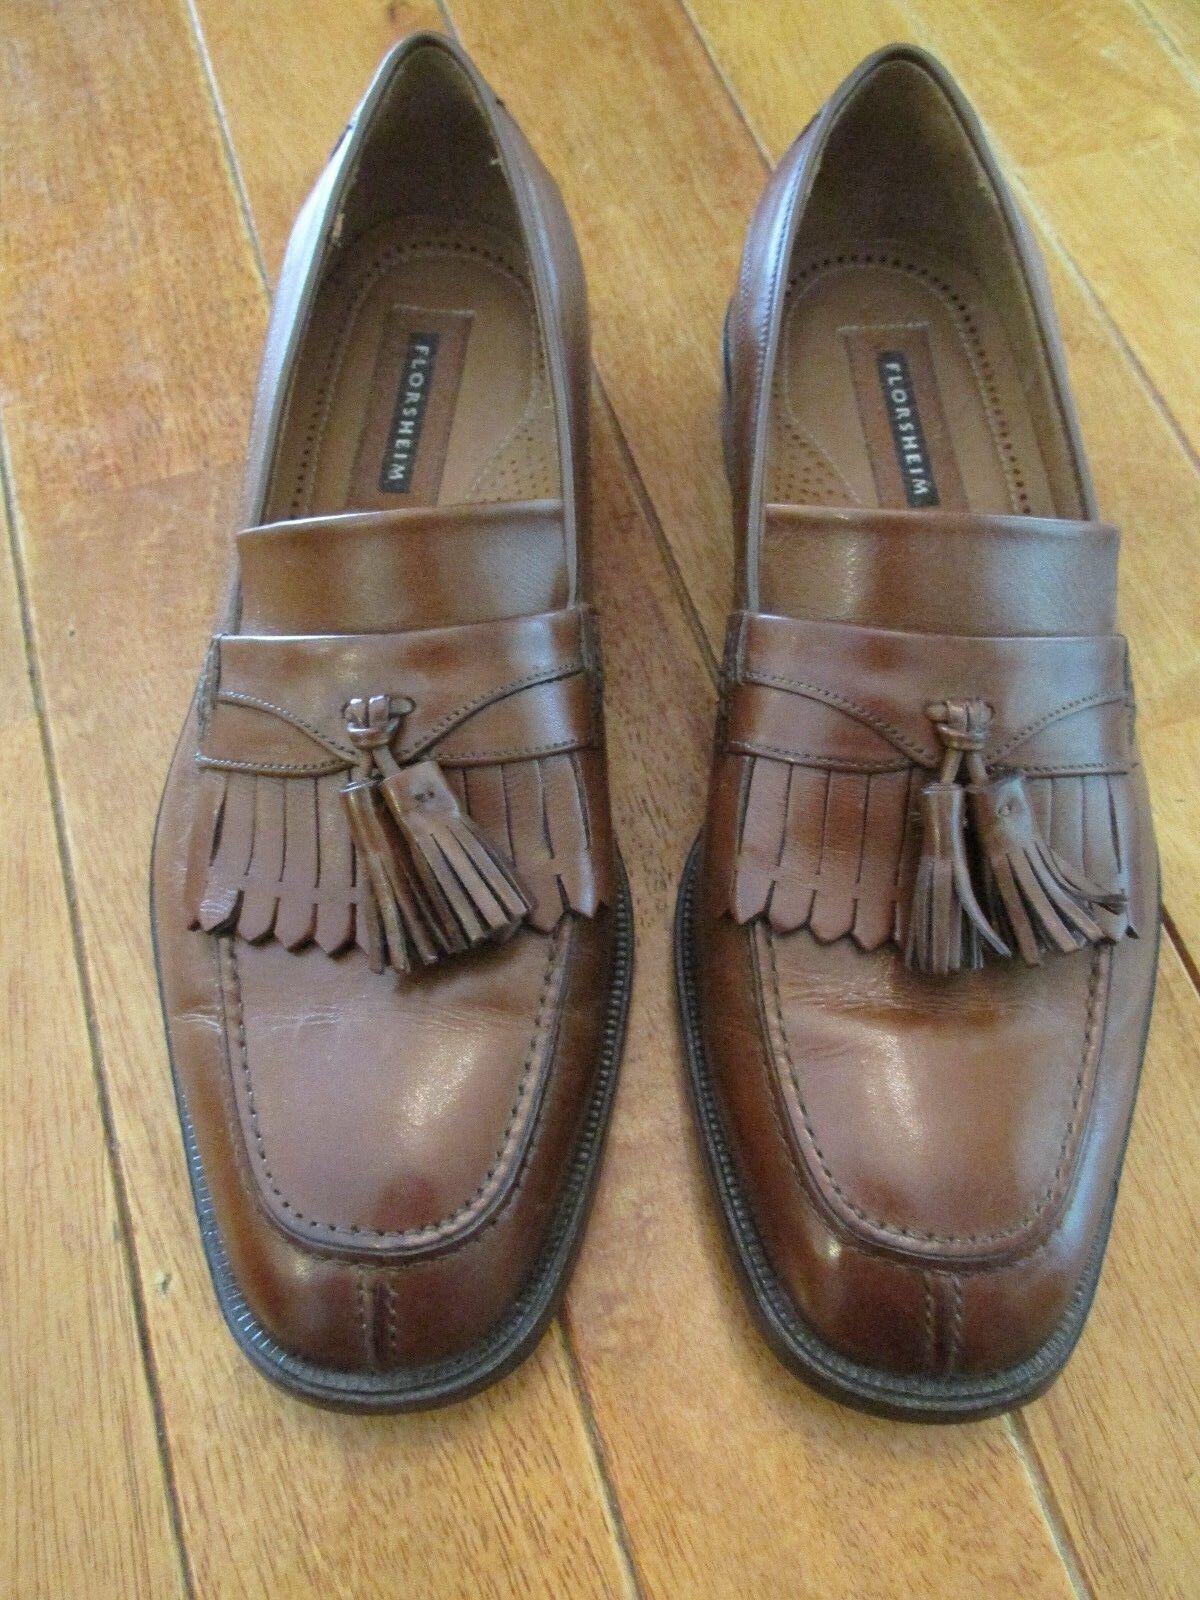 Florsheim Leather Loafers Size 10.5 D Brown Leather Florsheim Wingtip Tassel Slip-On Shoes a52156